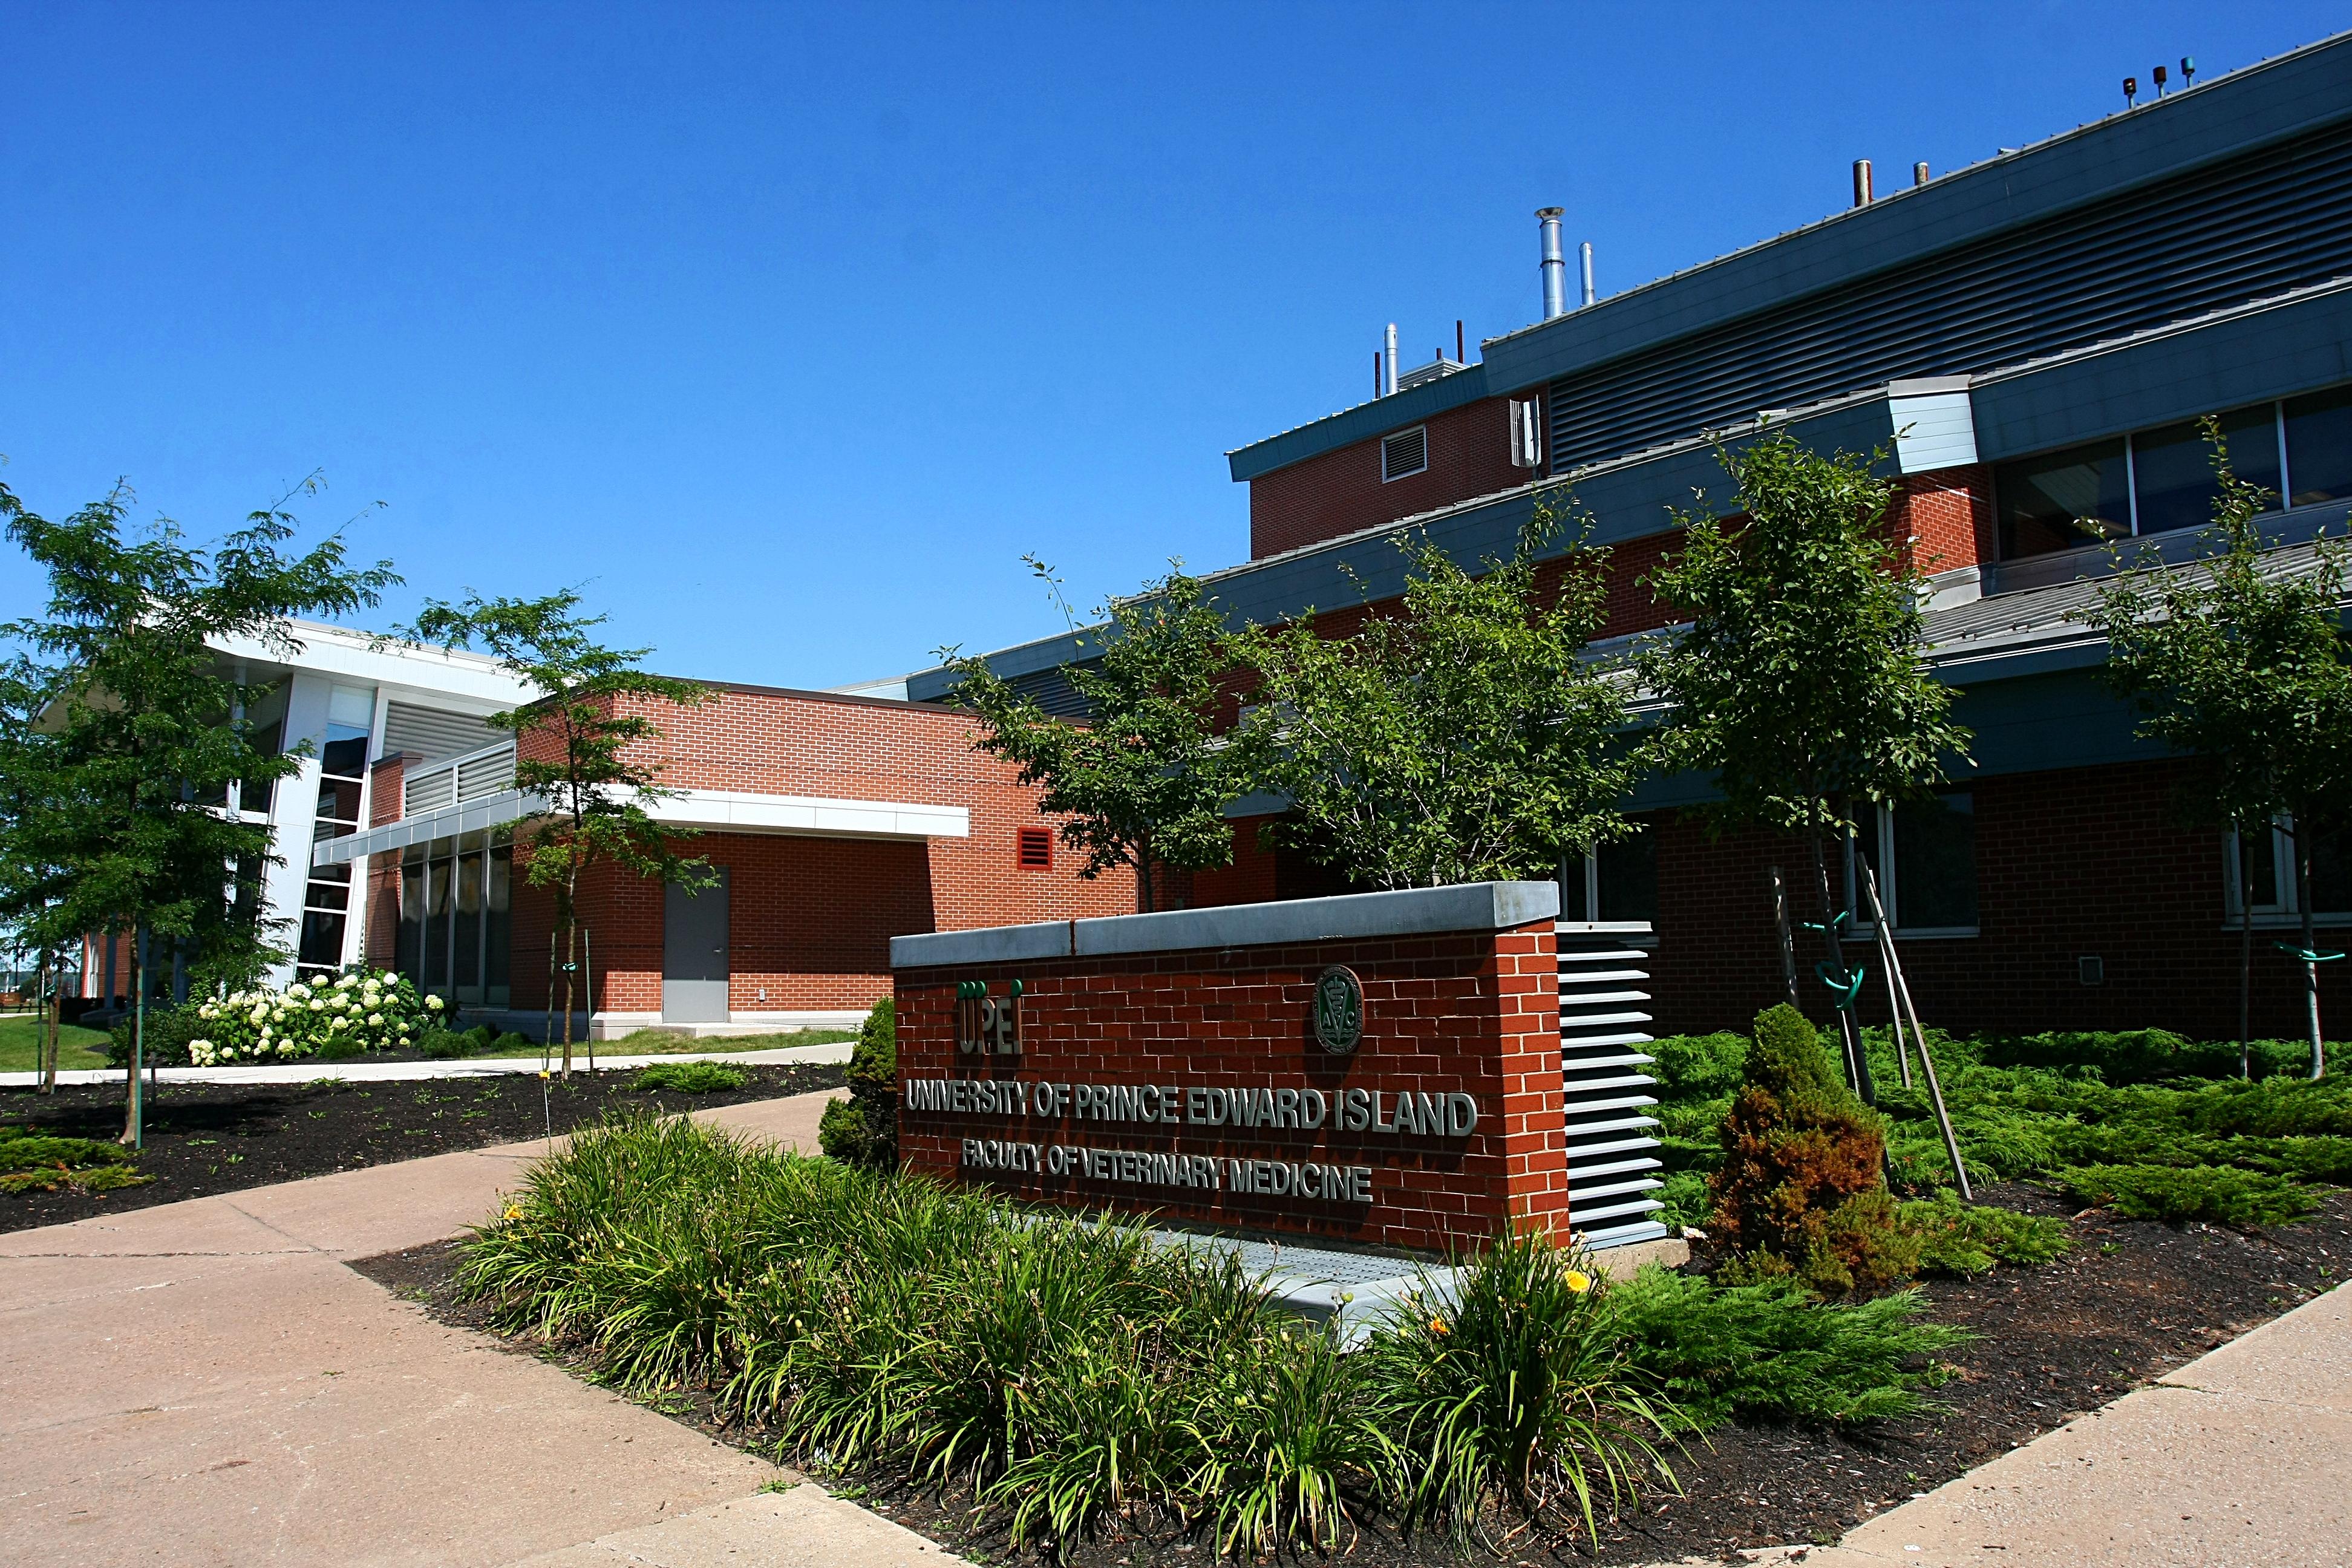 University Of Prince Edward Island >> Atlantic Veterinary College Wikipedia